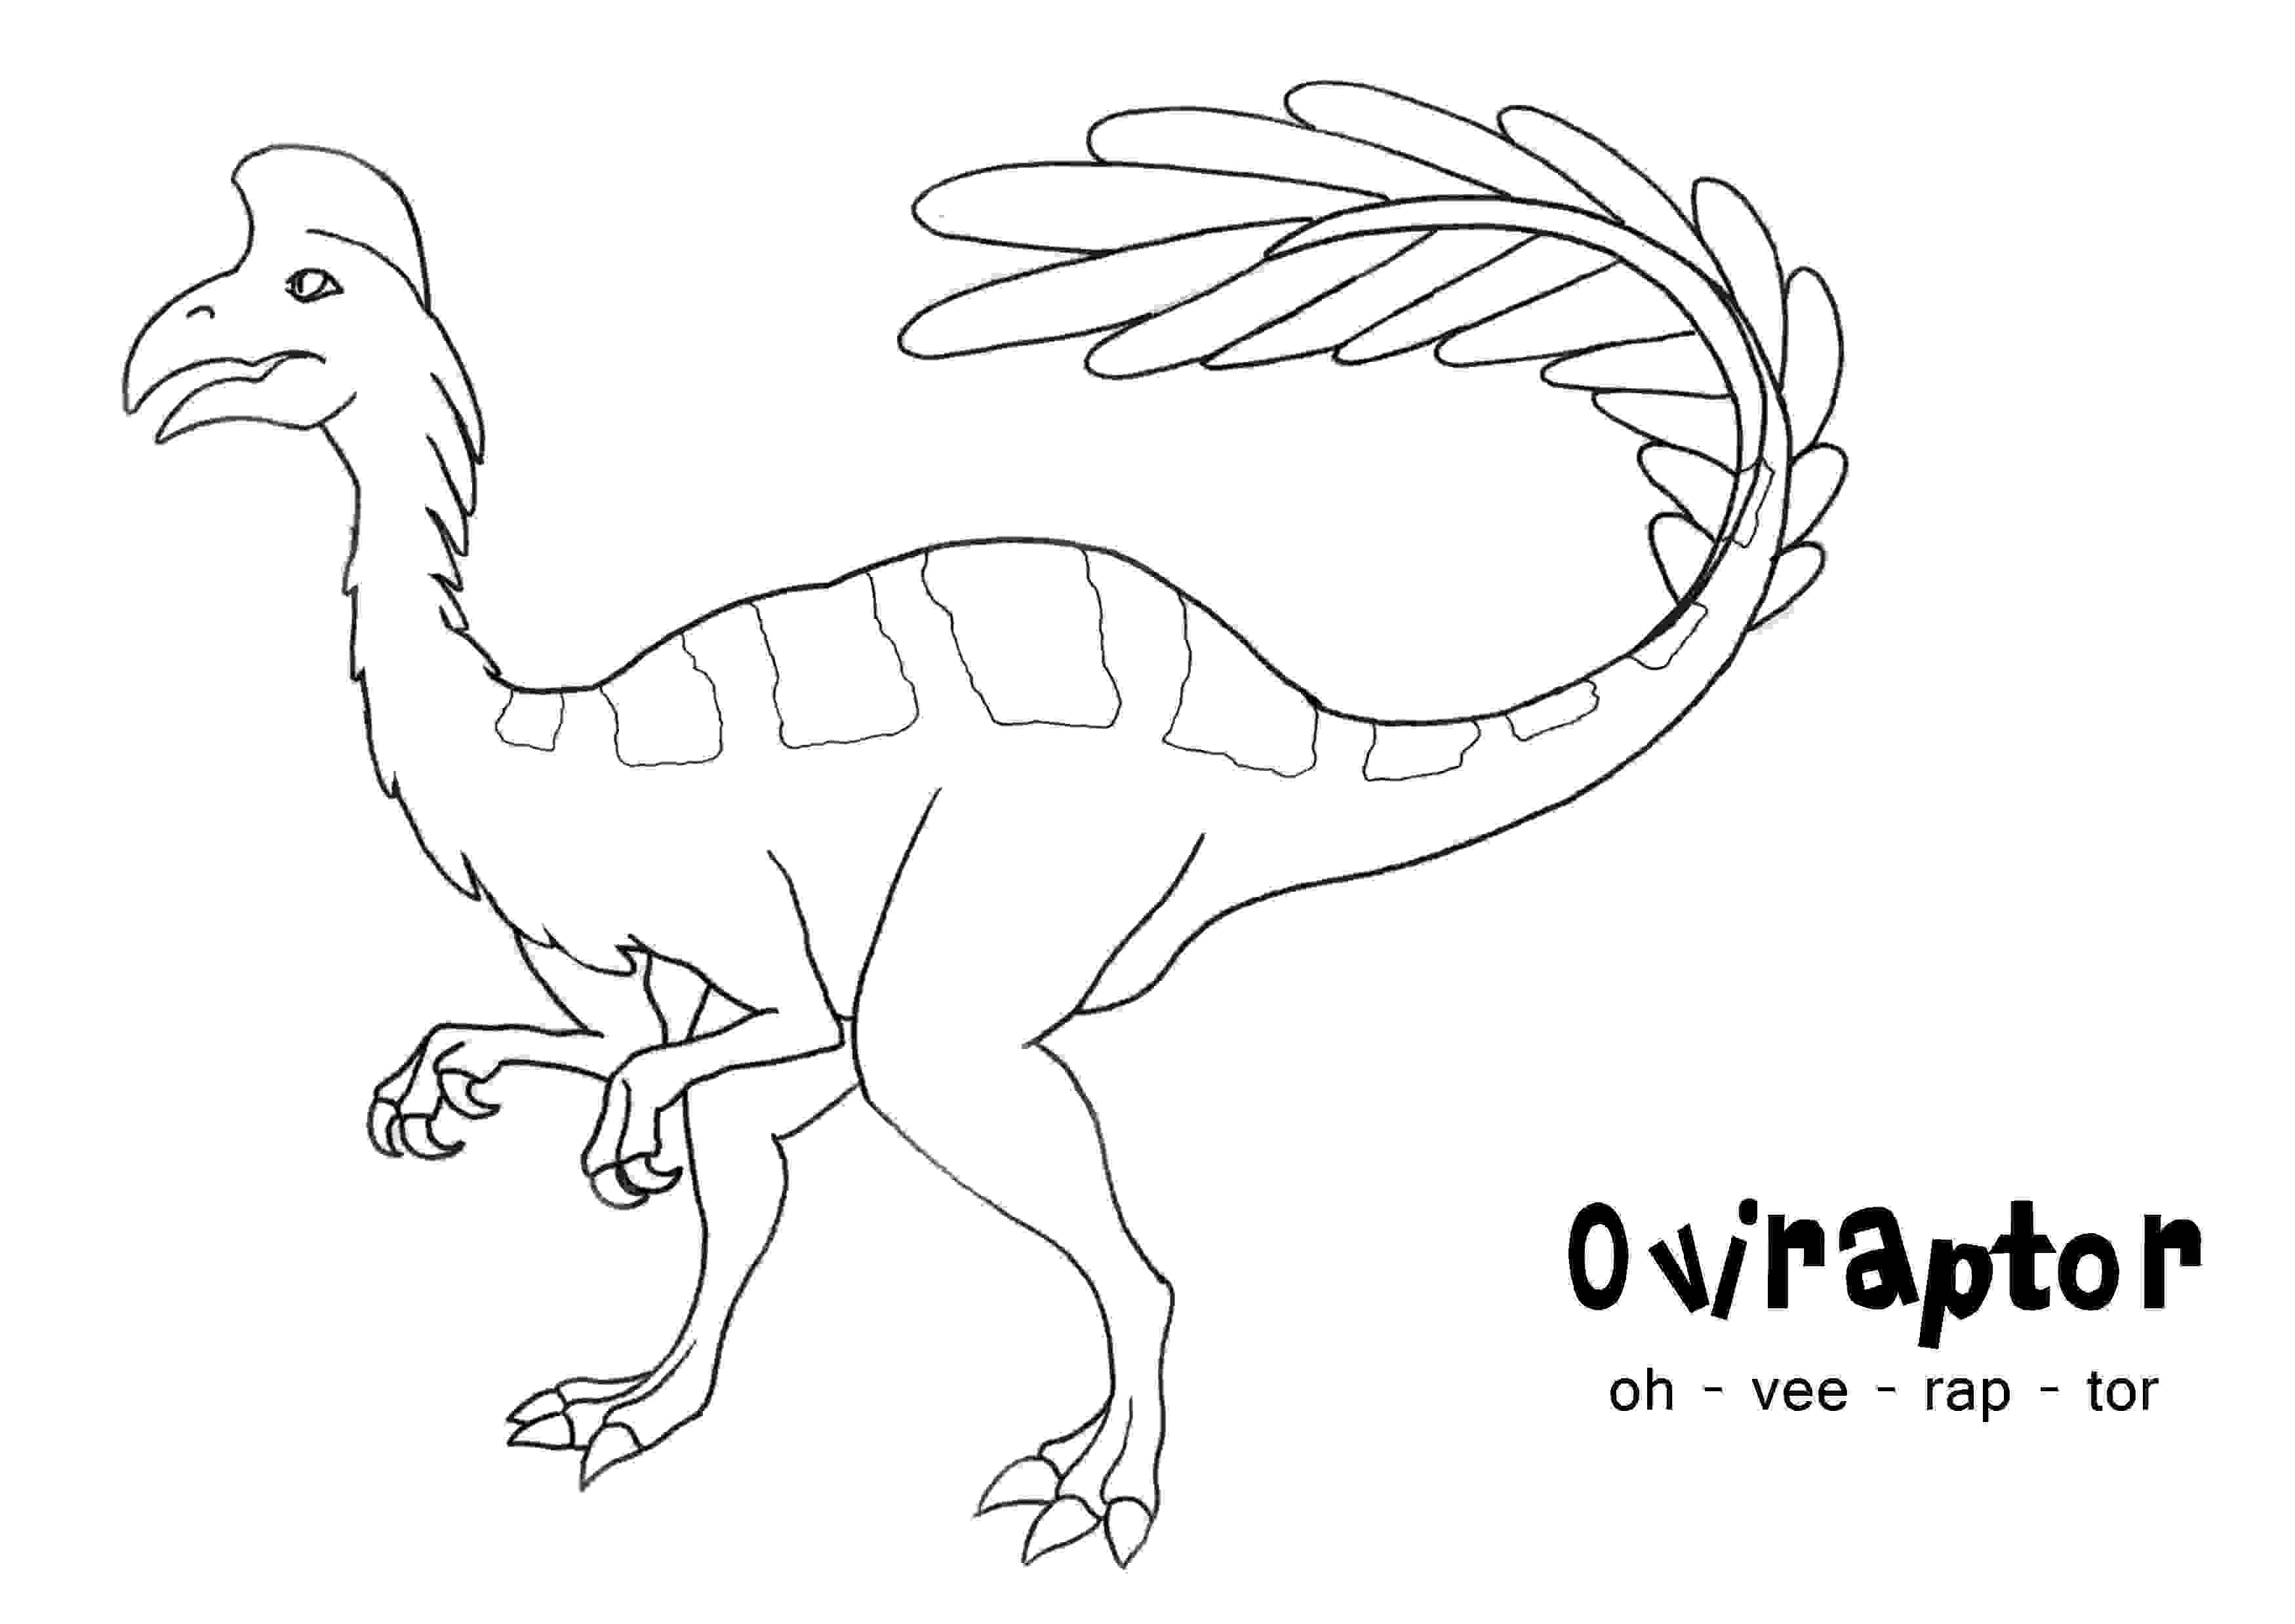 Oviraptor is genus of feather dinosaur of Archaeopteryx type